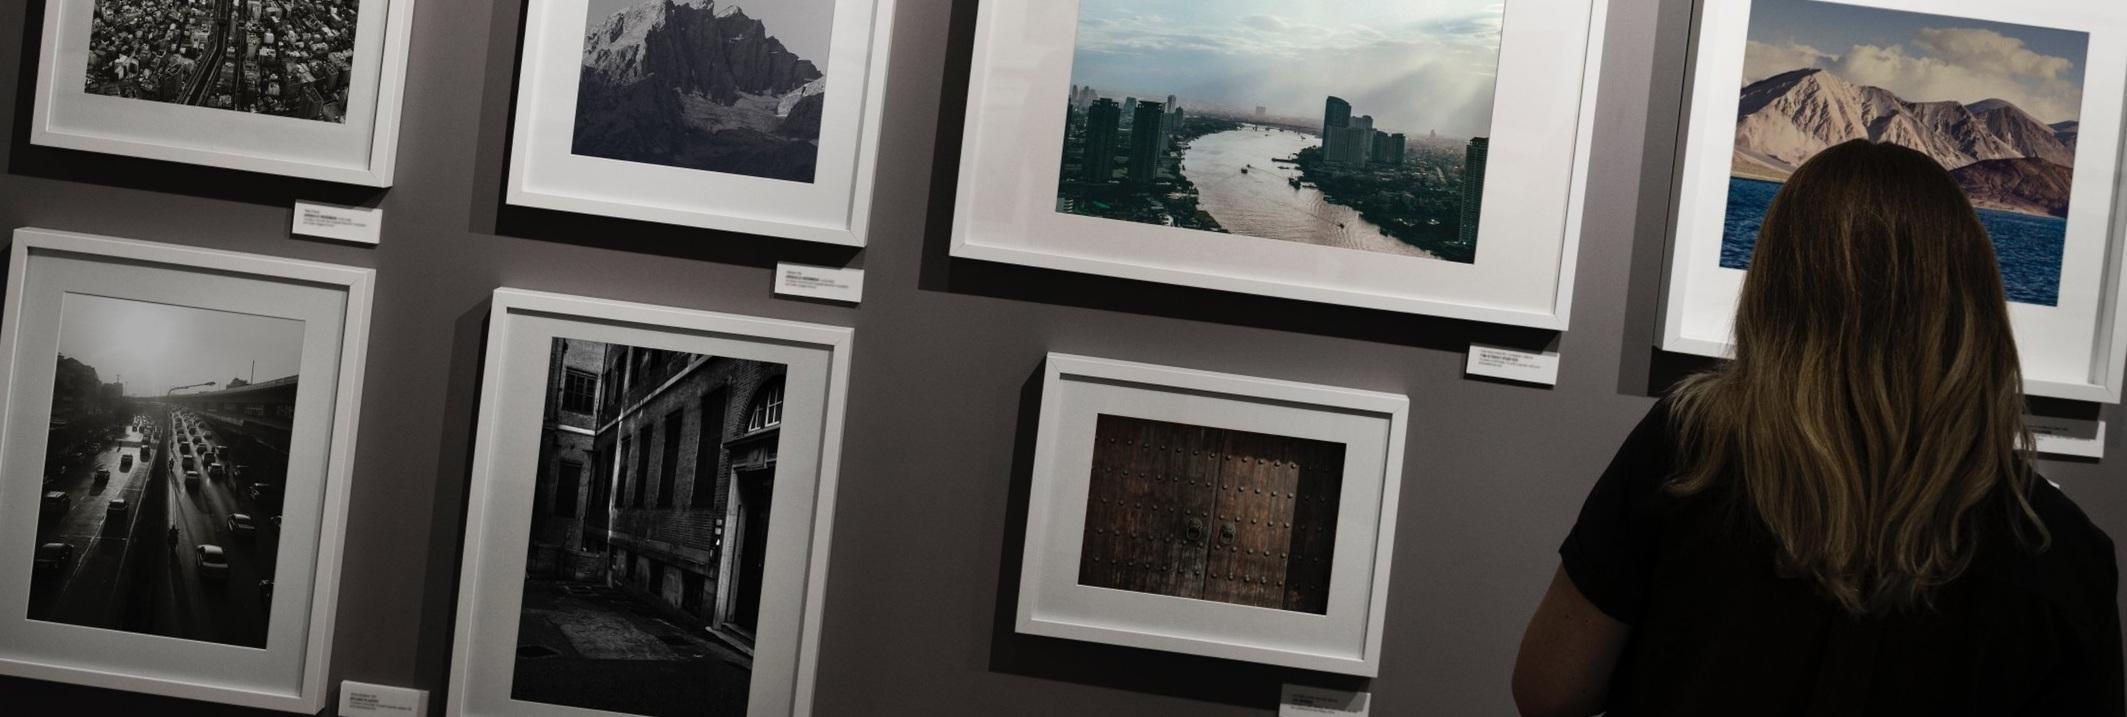 Unsplash-+picture+art.jpg